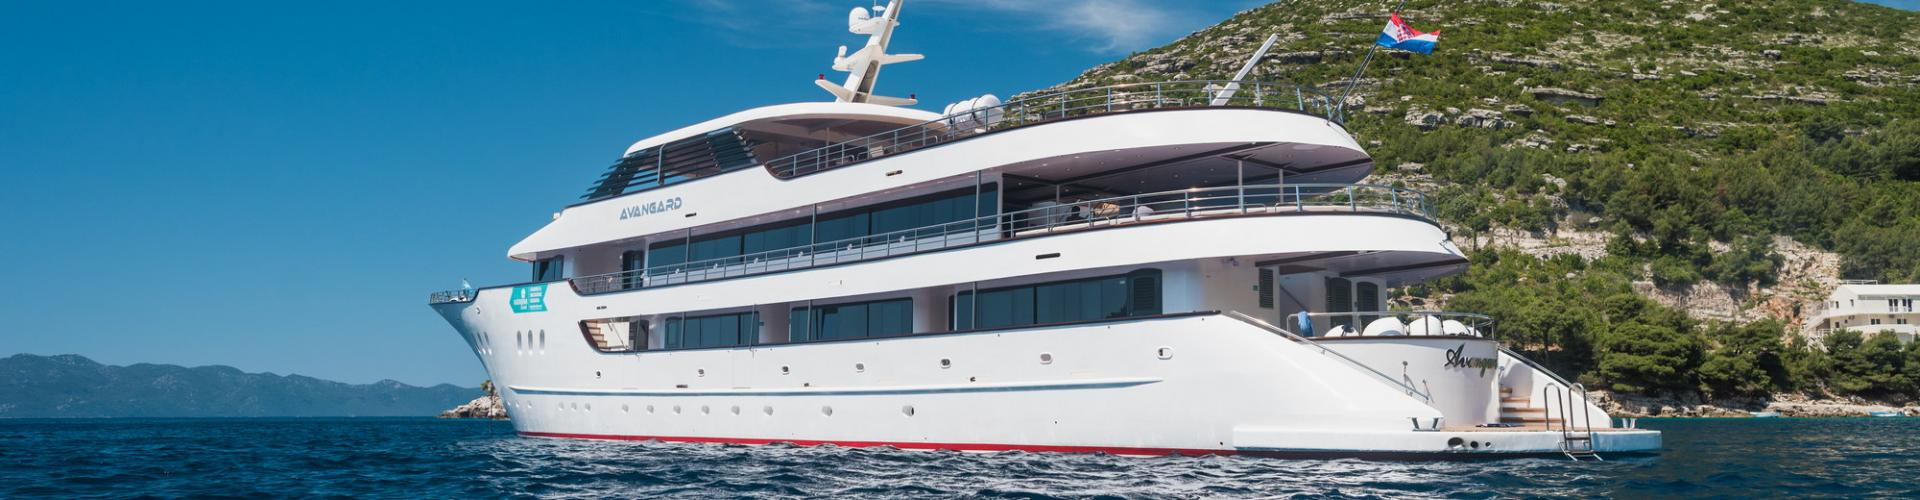 2017. Deluxe Superior nave da crociera MV Avangard